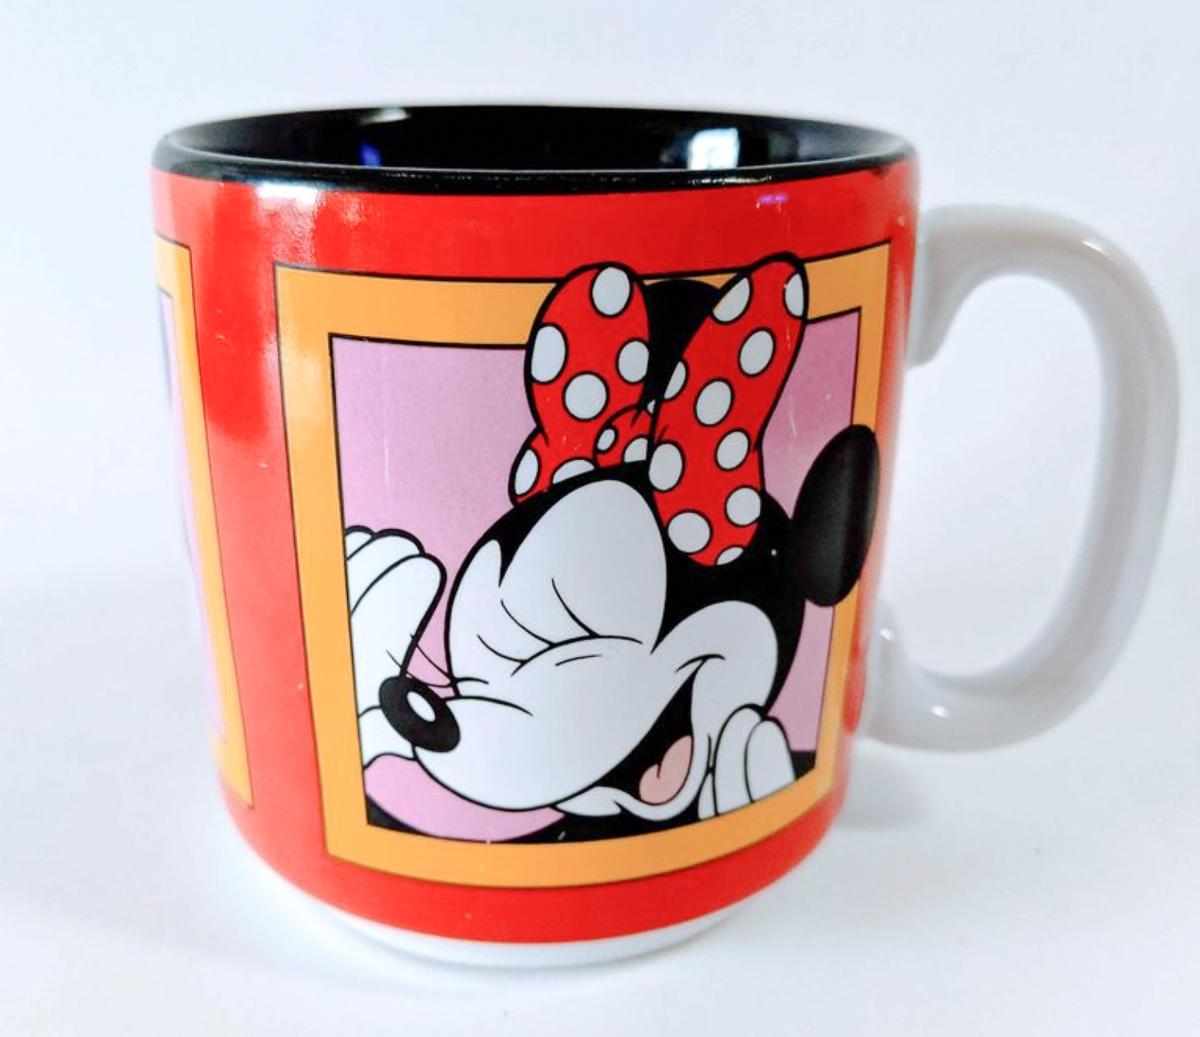 Disney World Souvenirs Coffee Mug with Minnie Mouse